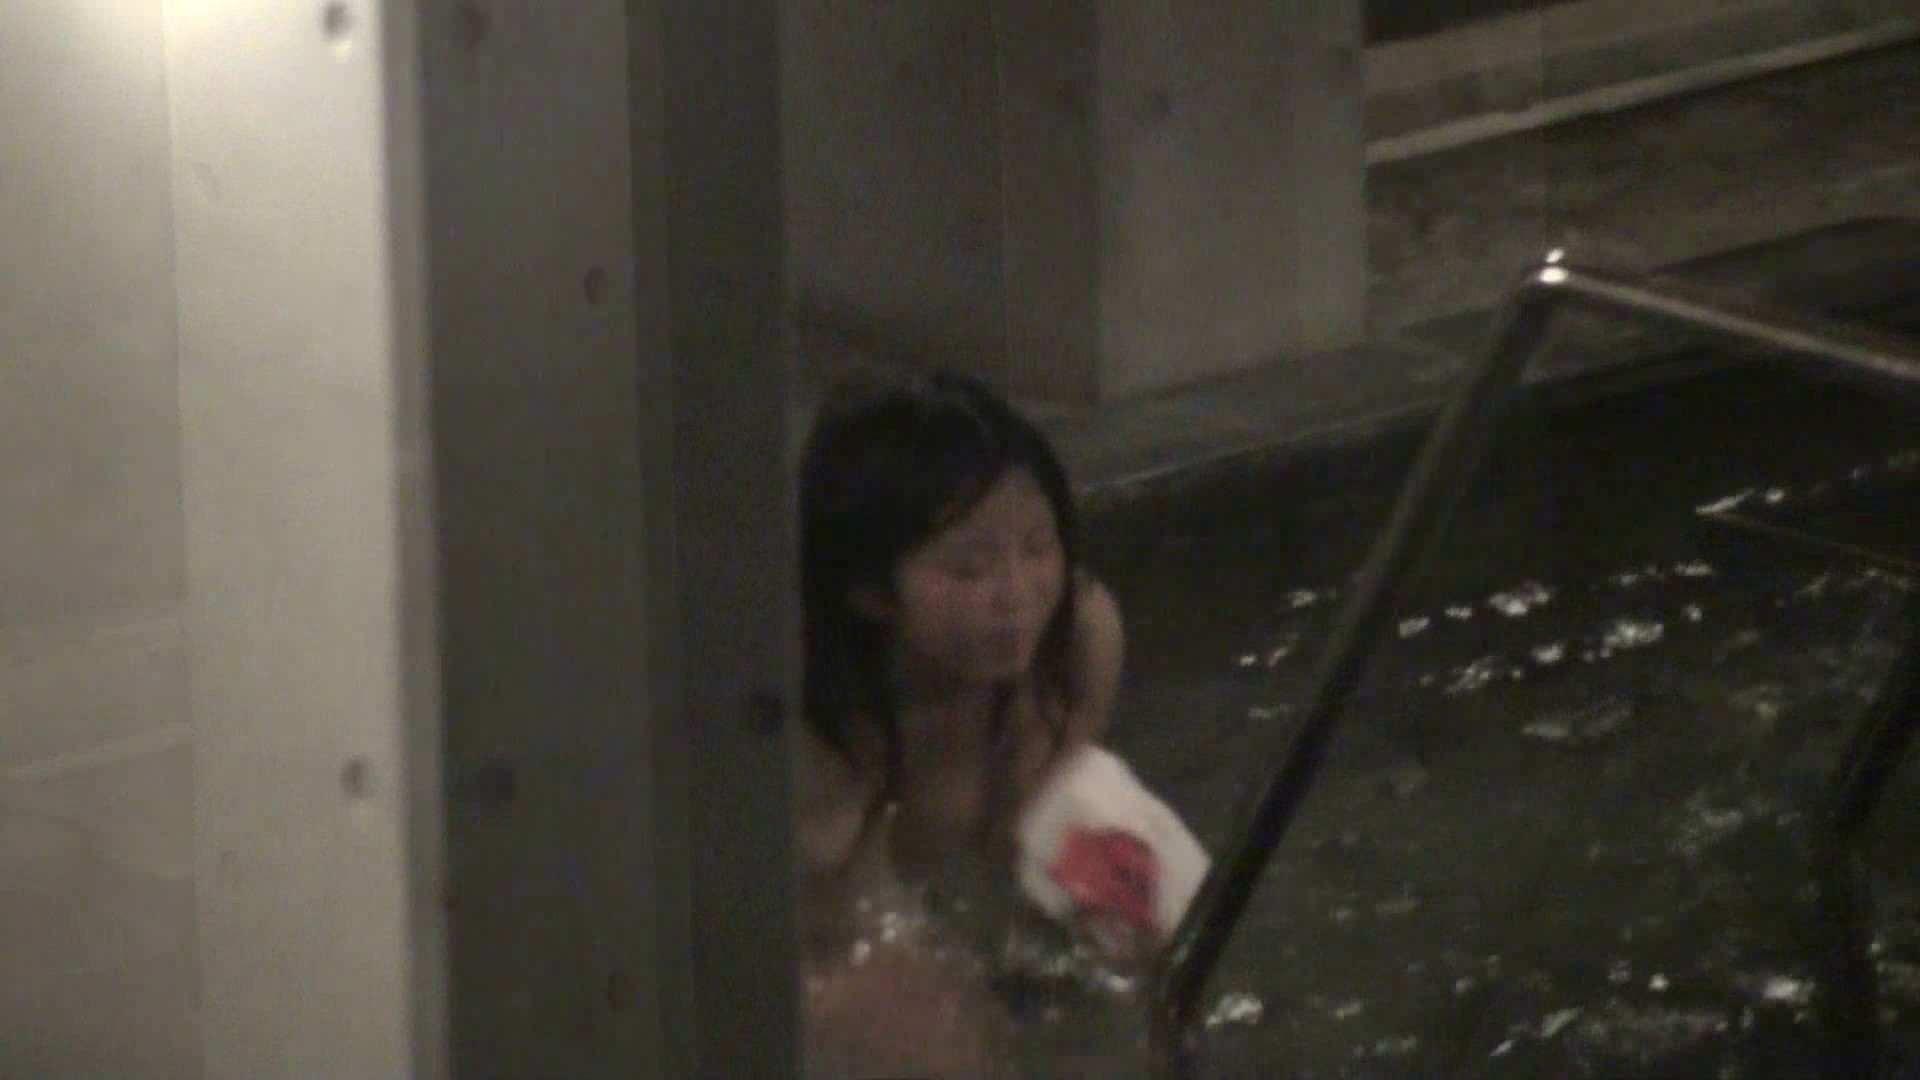 Aquaな露天風呂Vol.326 盗撮 おめこ無修正動画無料 105画像 44